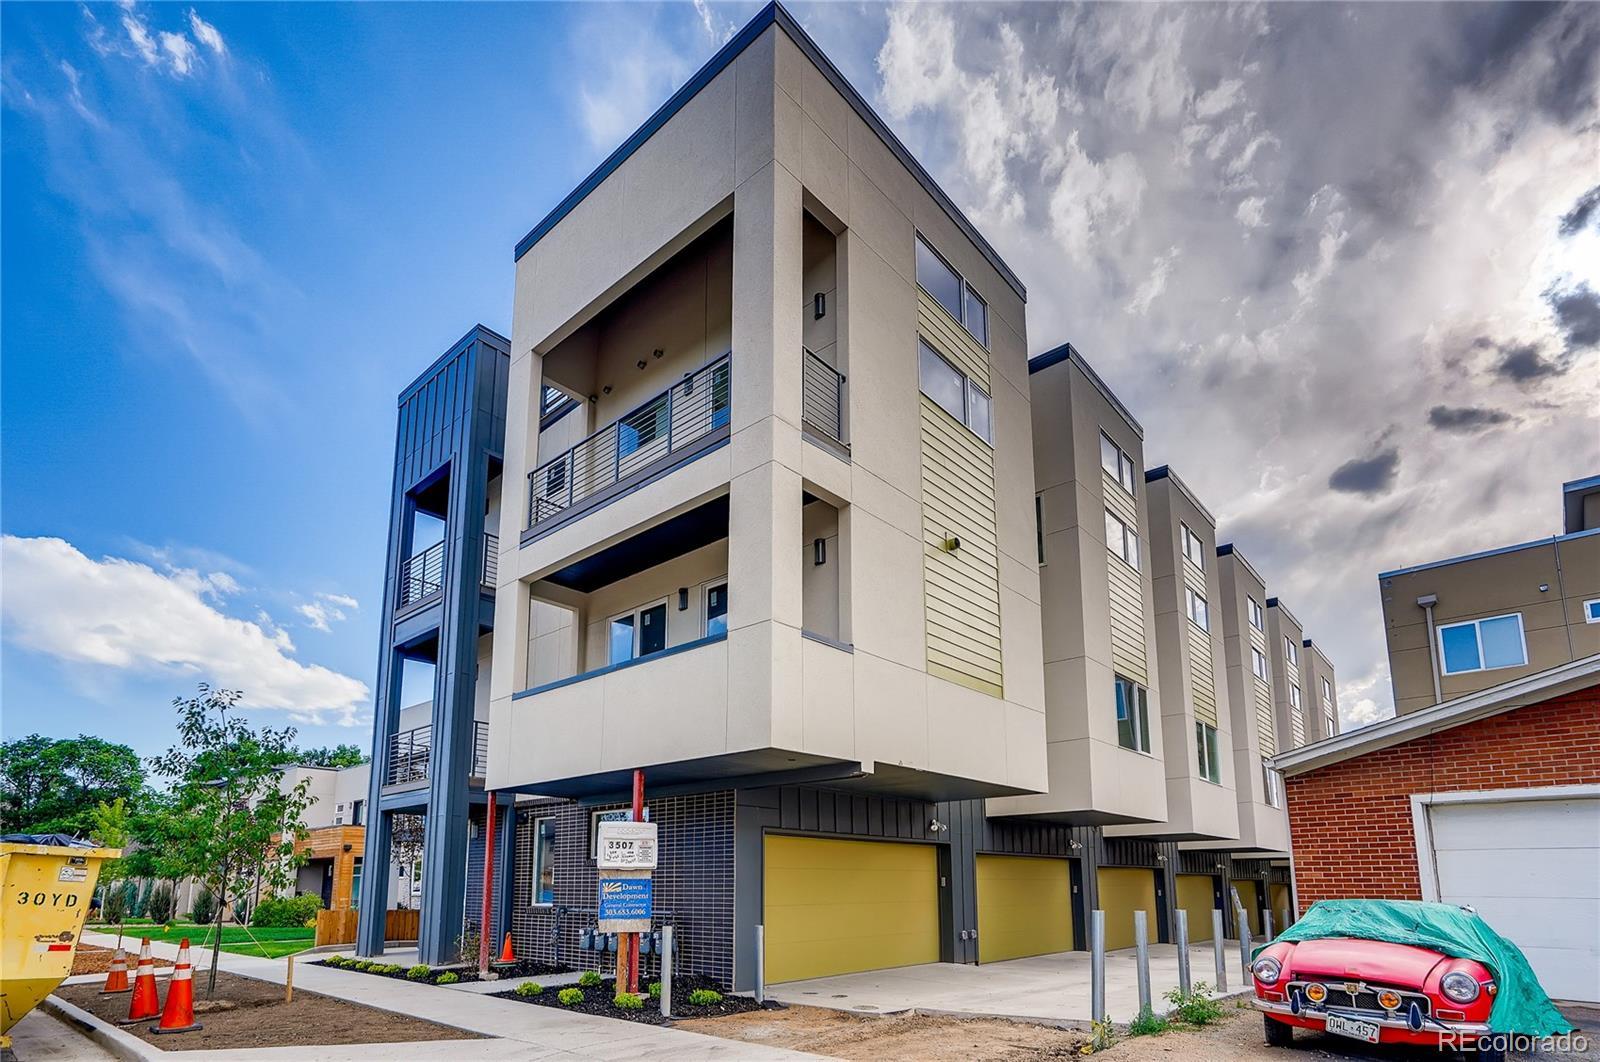 3507 S Ogden Street #C Property Photo - Englewood, CO real estate listing